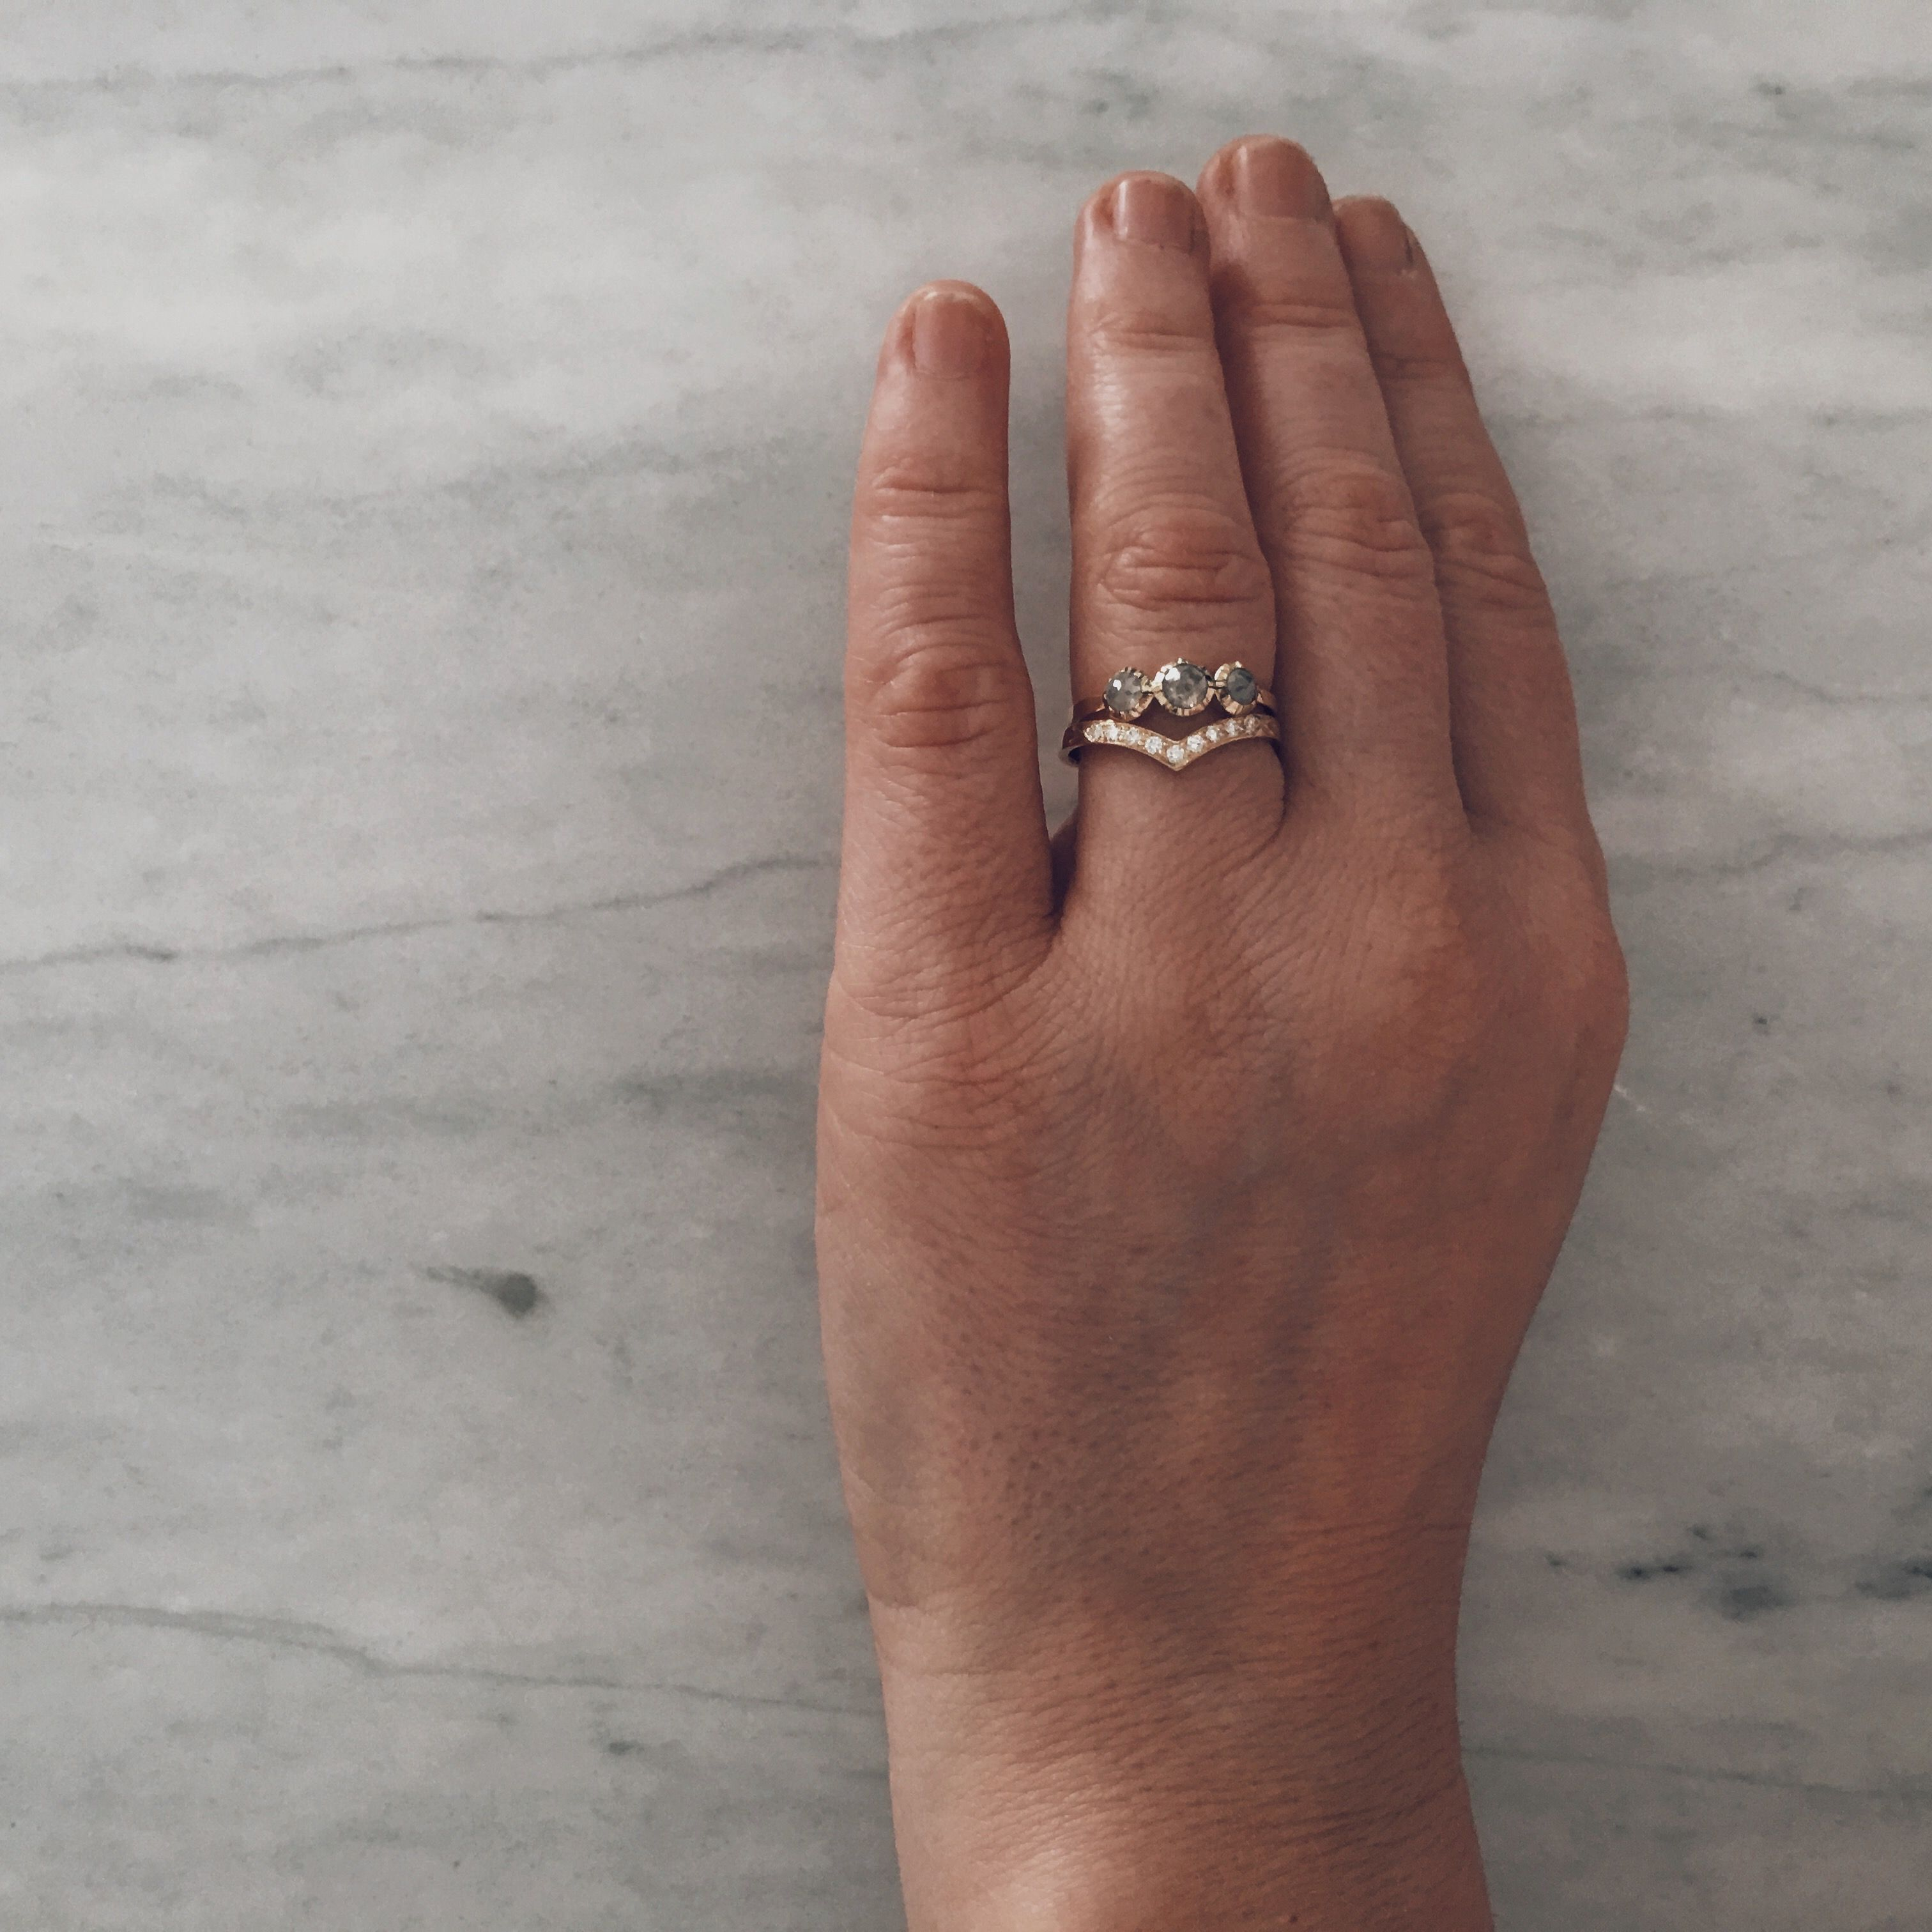 Pin On Jewelry Love